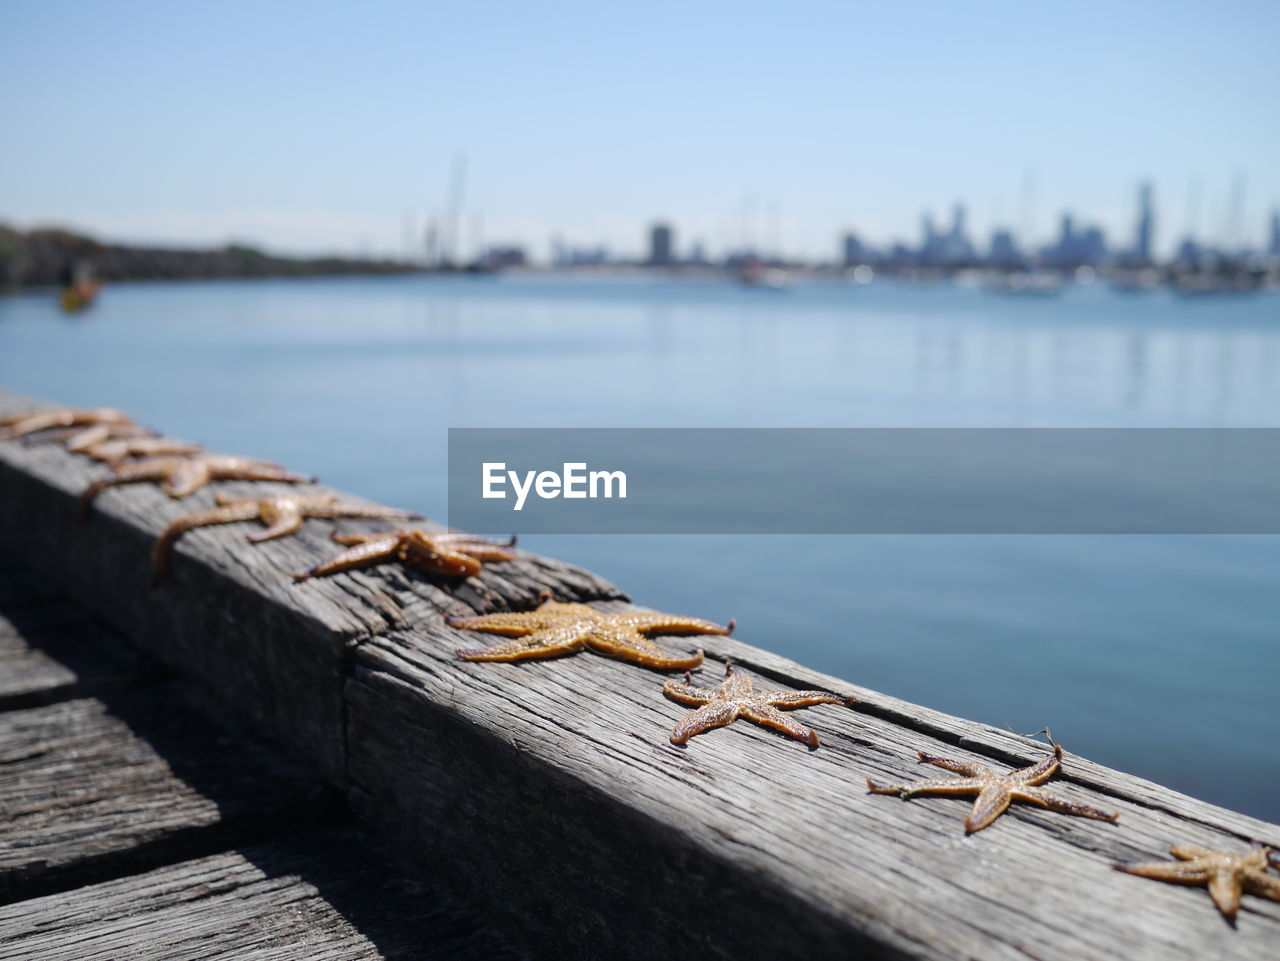 Dead starfish on pier by sea against sky